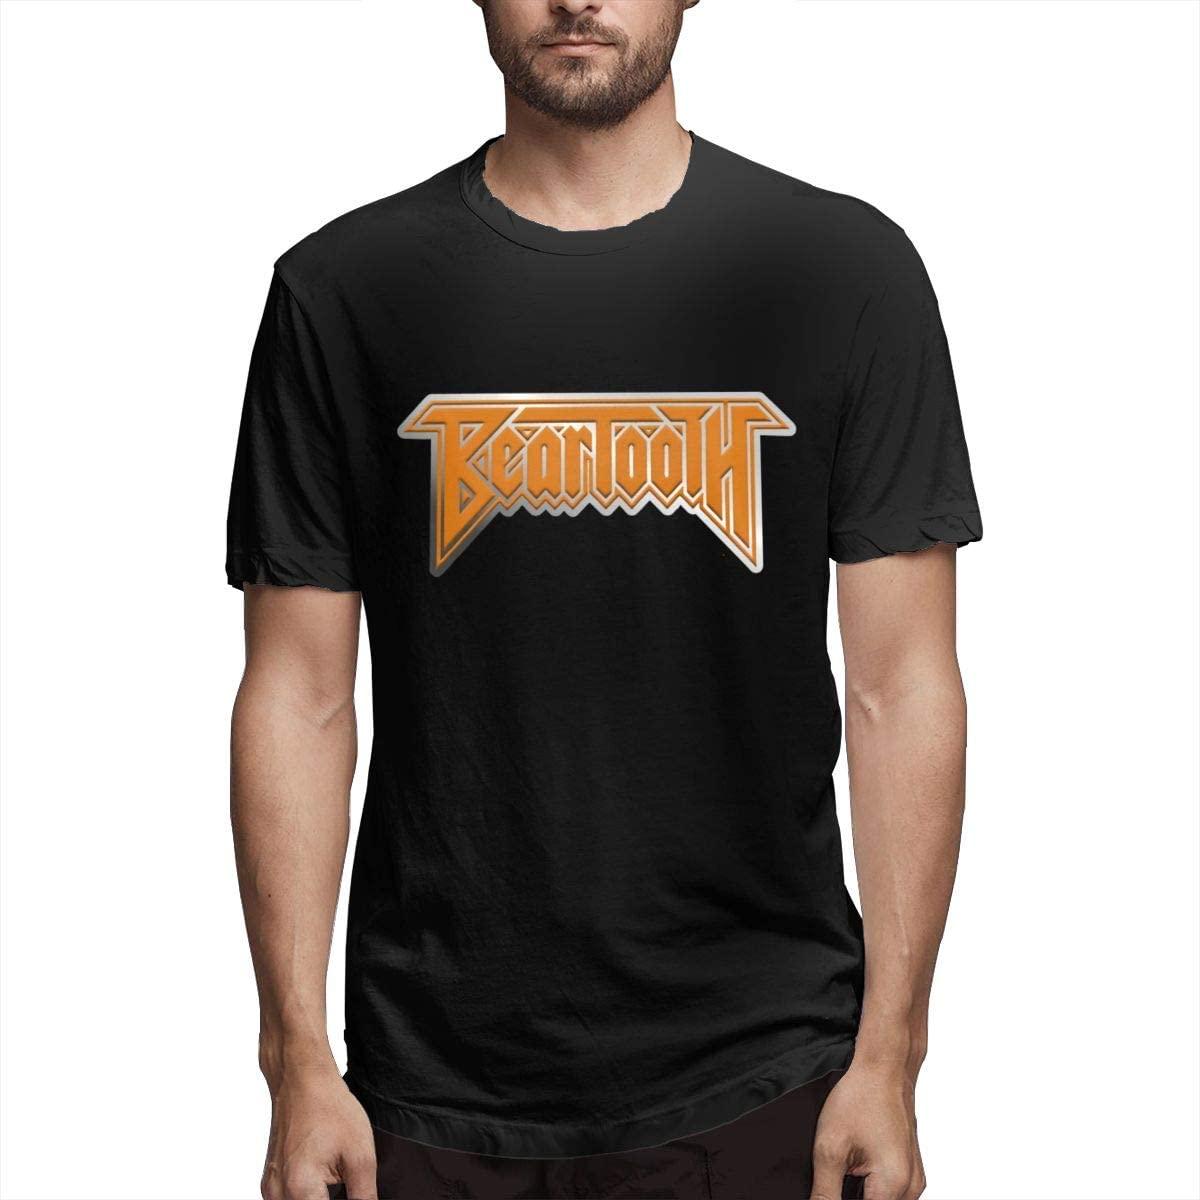 Wbenda Beartooth Mens Short Sleeve T-Shirts Crew Neck Cotton Casual Tee Undershirt Black